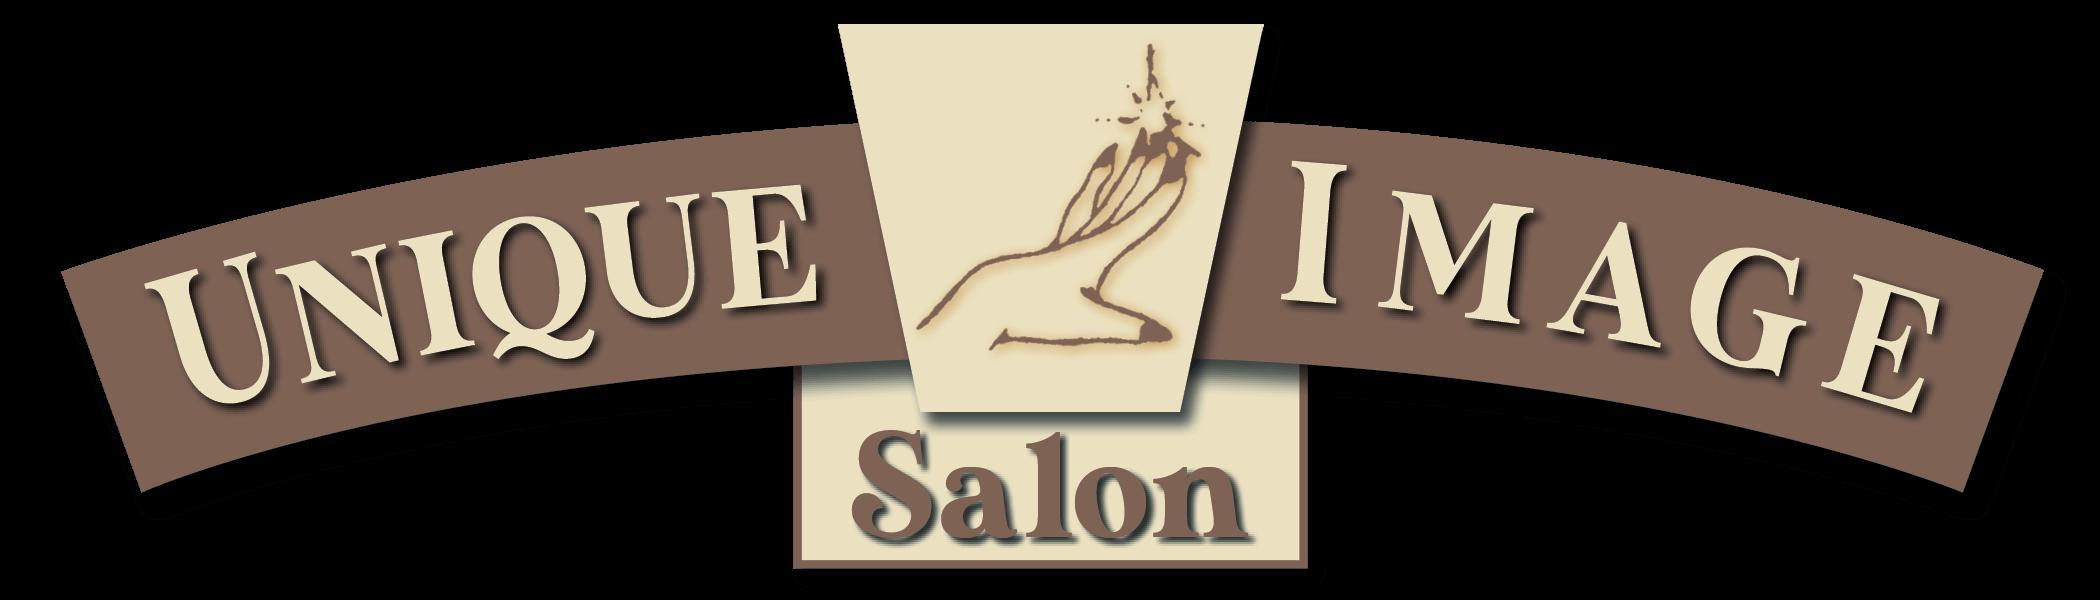 Unique Image Salon logo - Hartland Beauty Salon